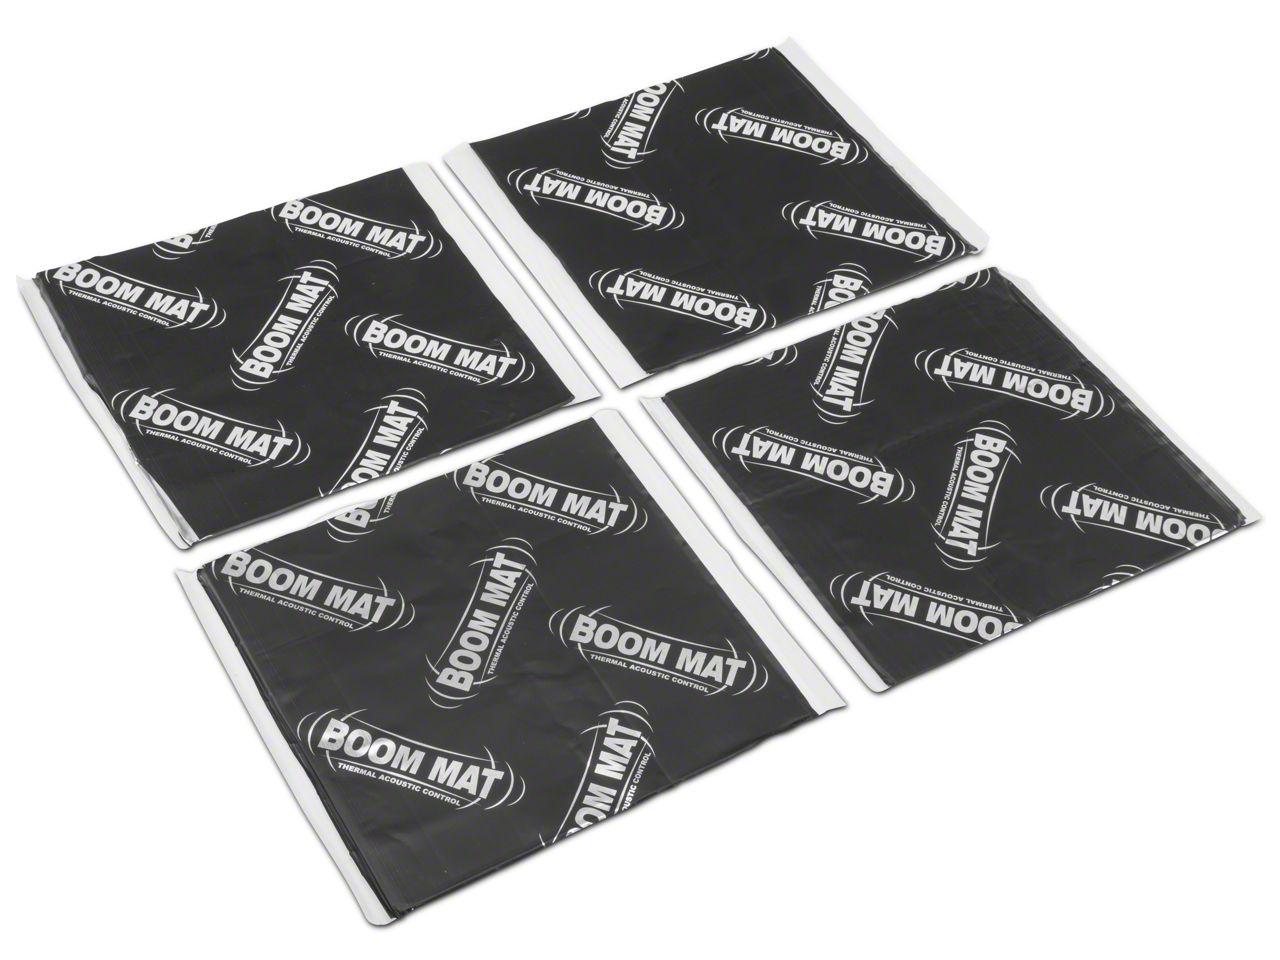 Boom Mat Vibration Dampening Material - 4 Sheets